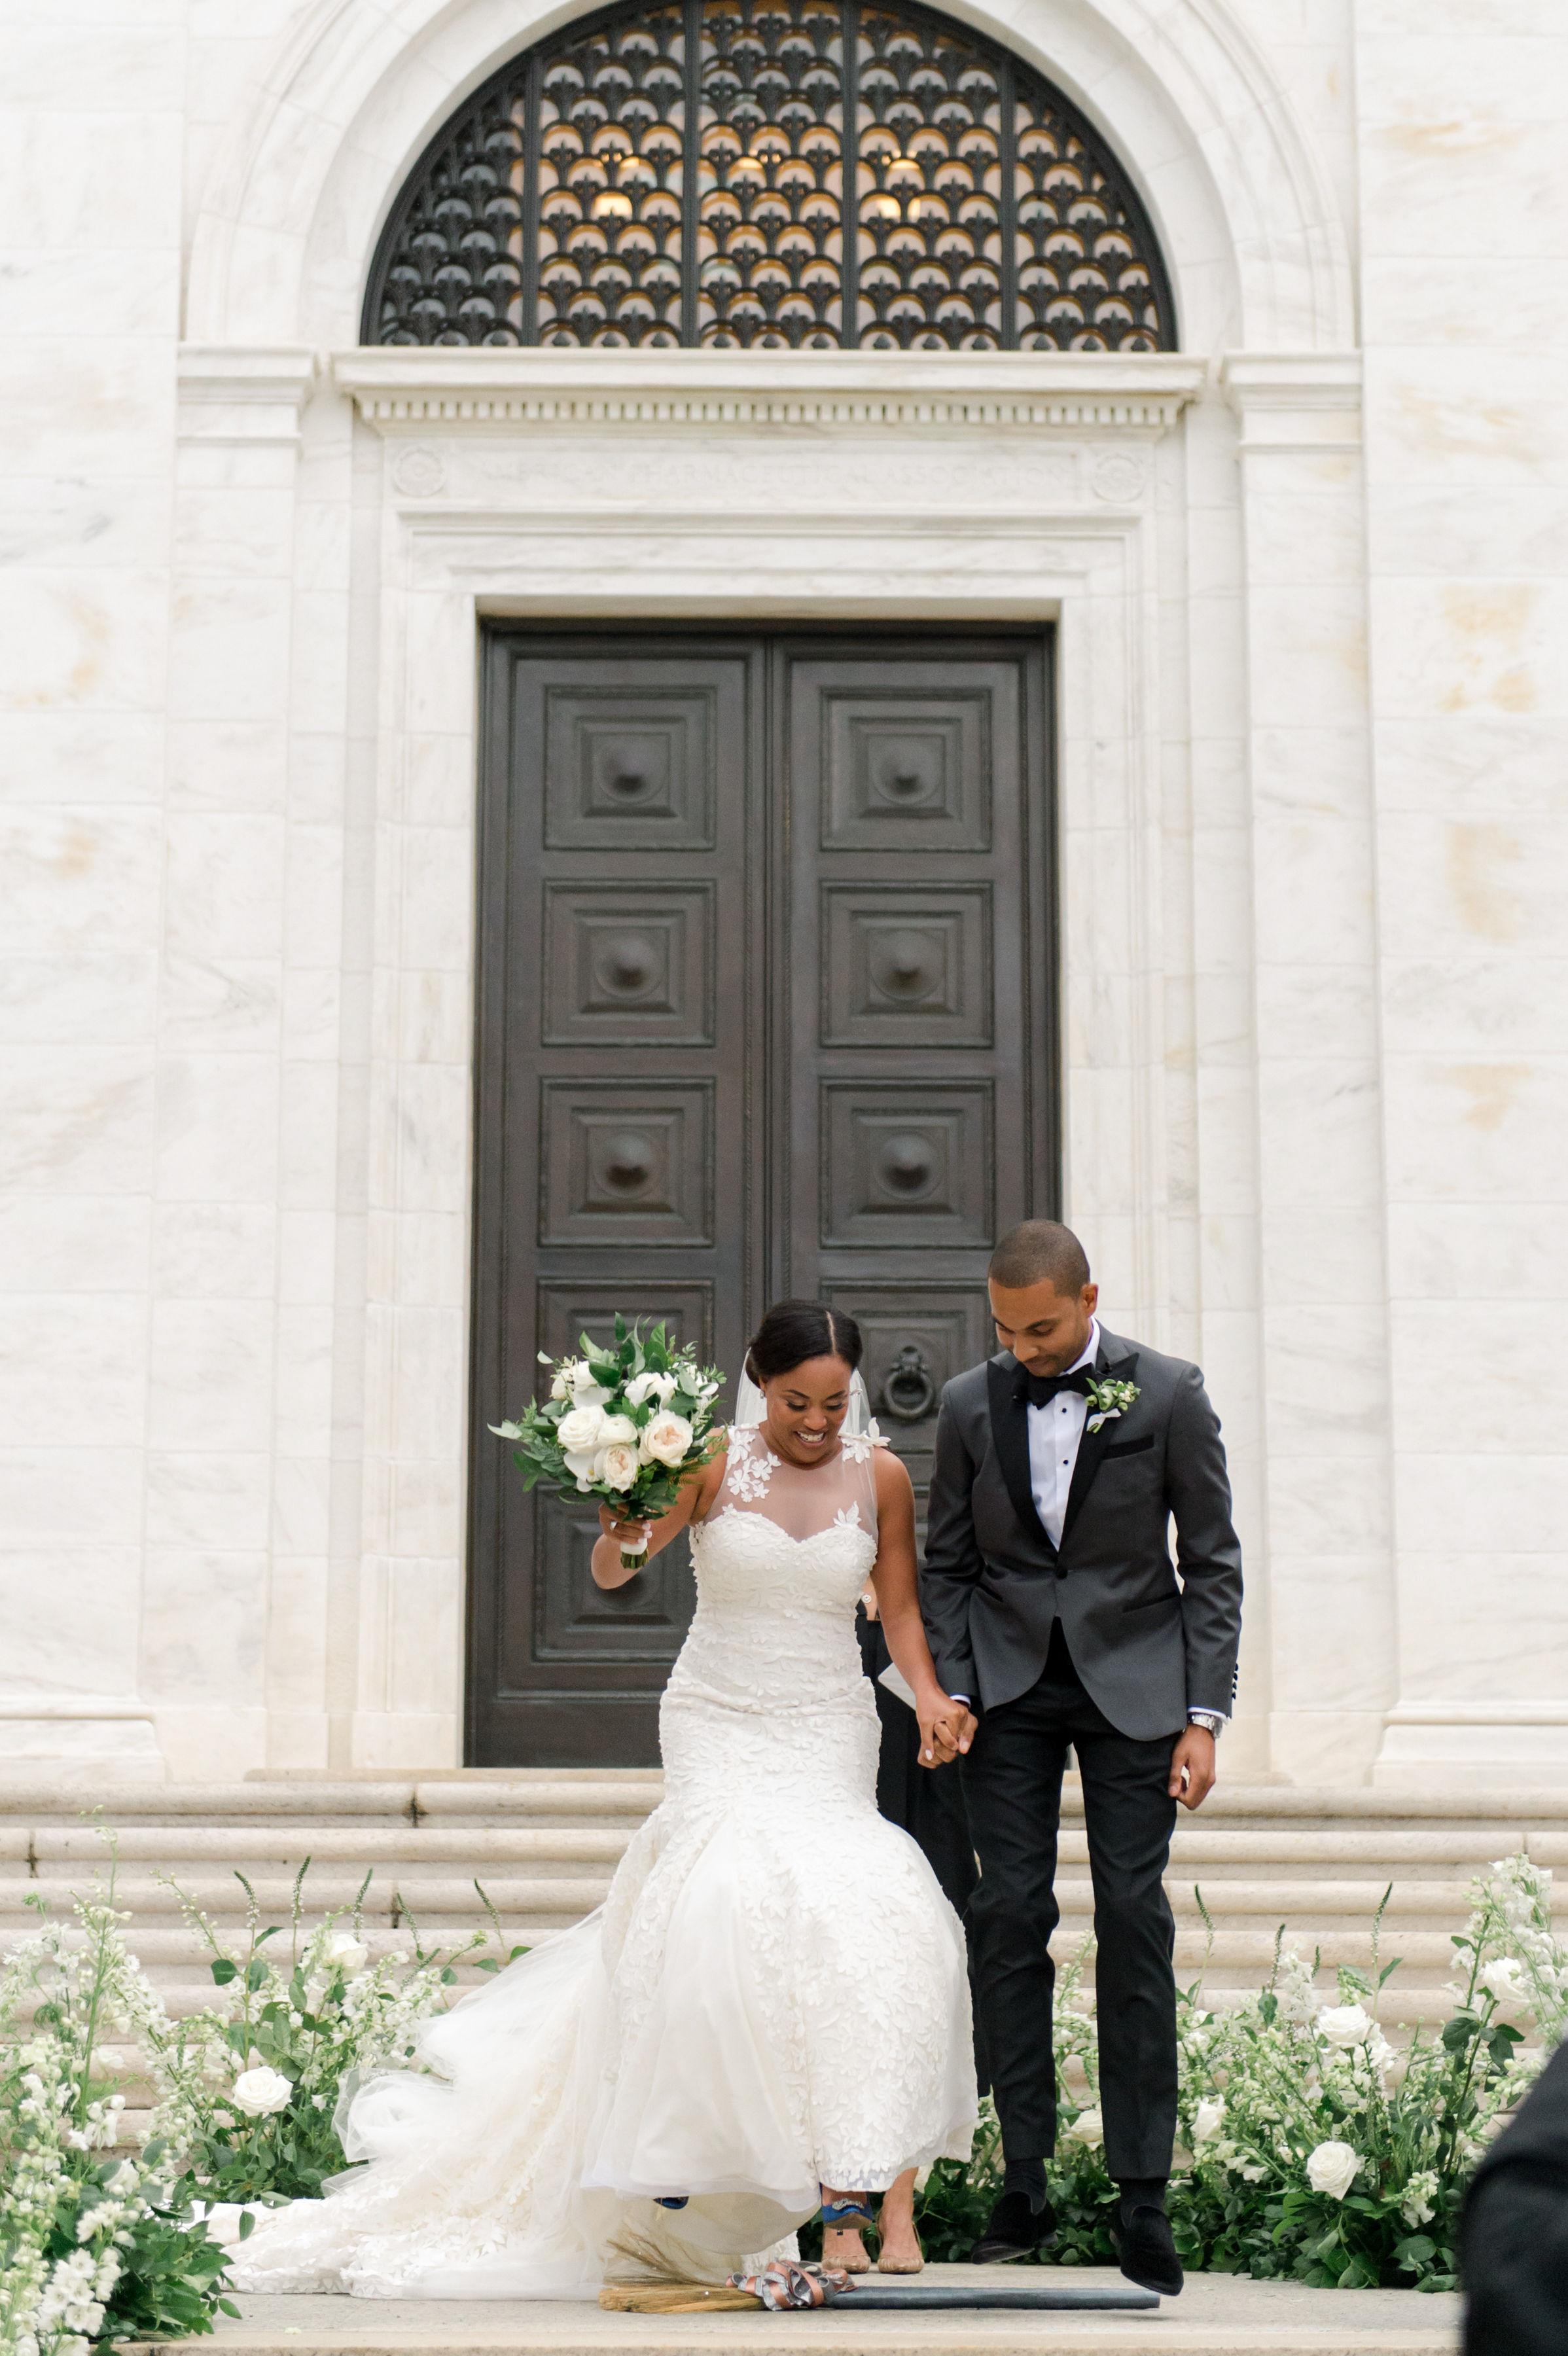 melissa justen wedding ceremony bride groom and broom